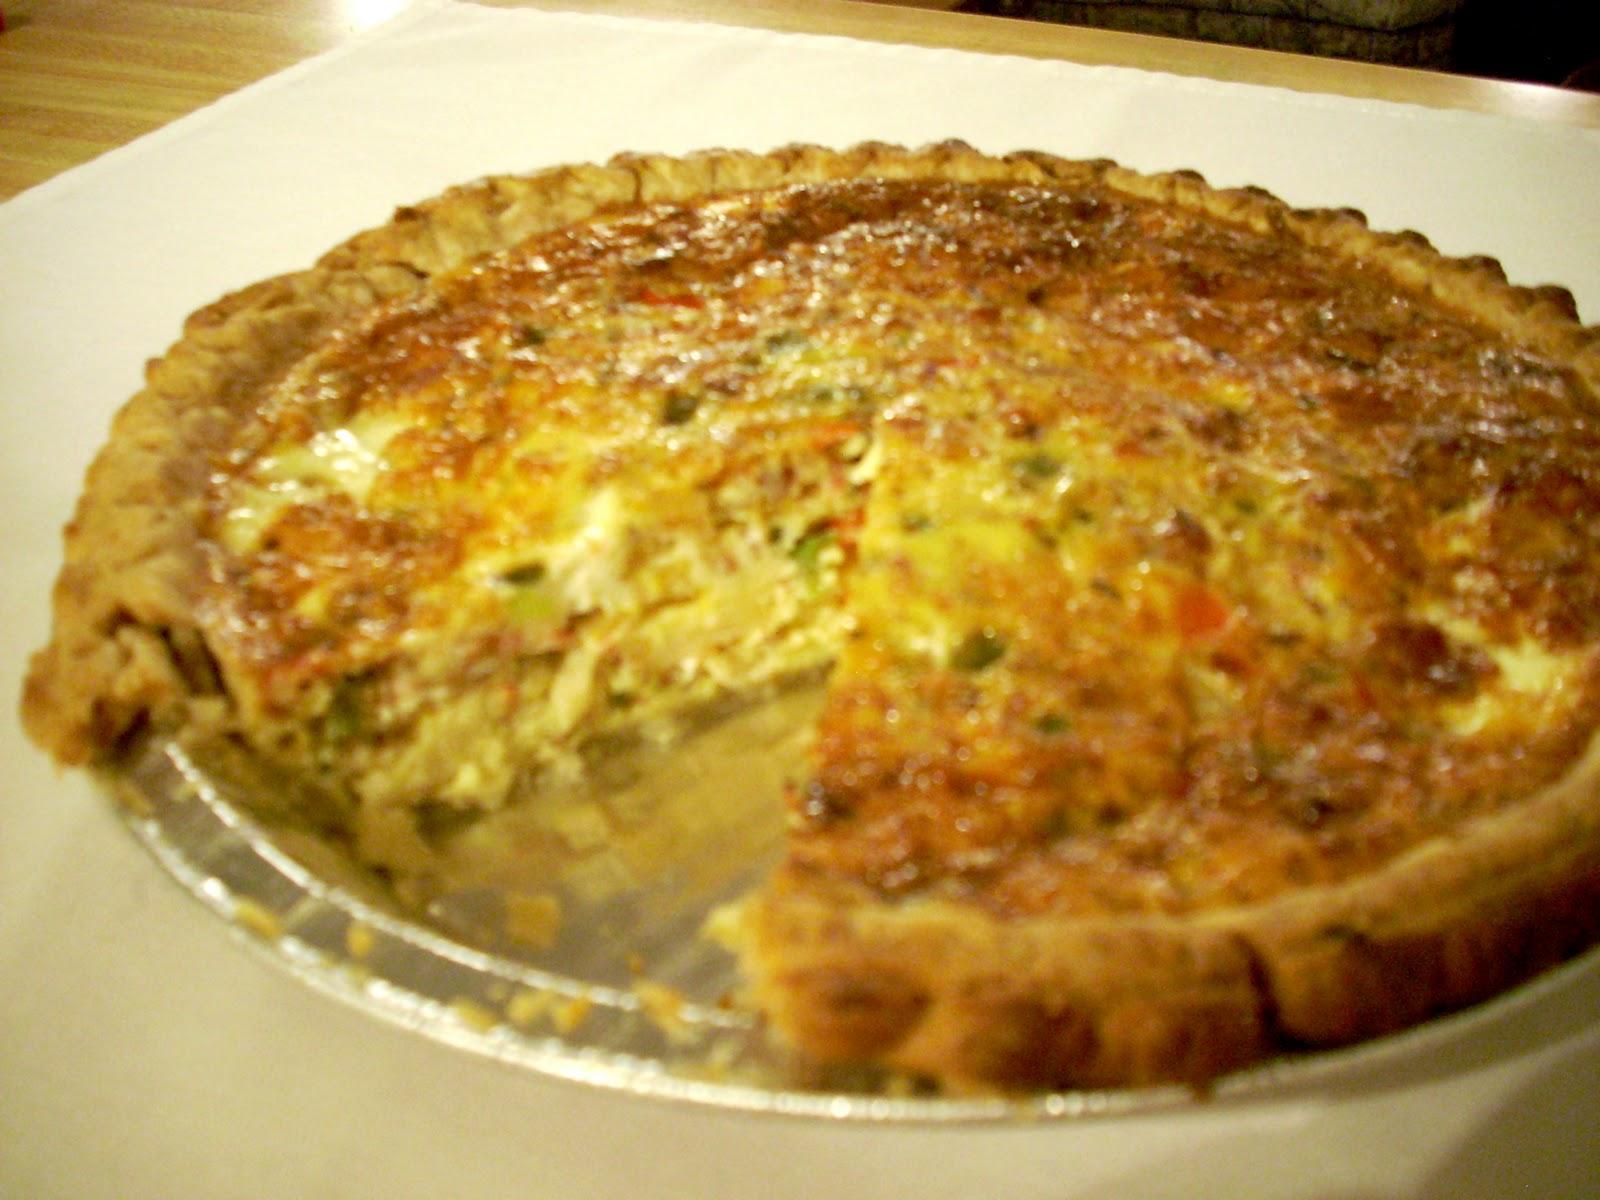 Texas Toast & Artichokes: Southwest Quiche Lorraine